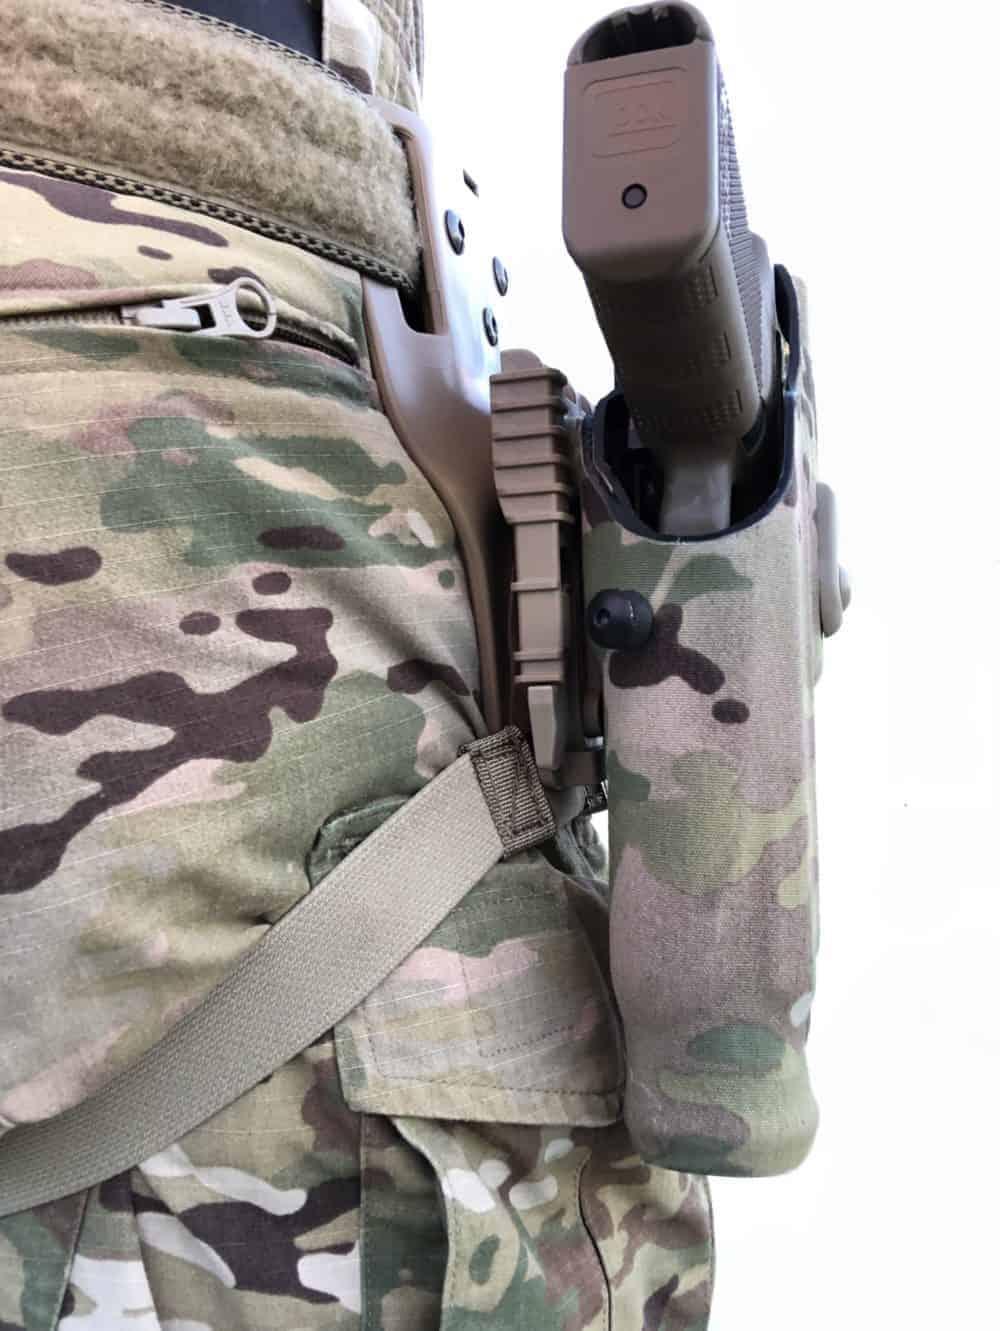 Safariland Holster Single Leg Strap Adapter | Arbor Arms USA